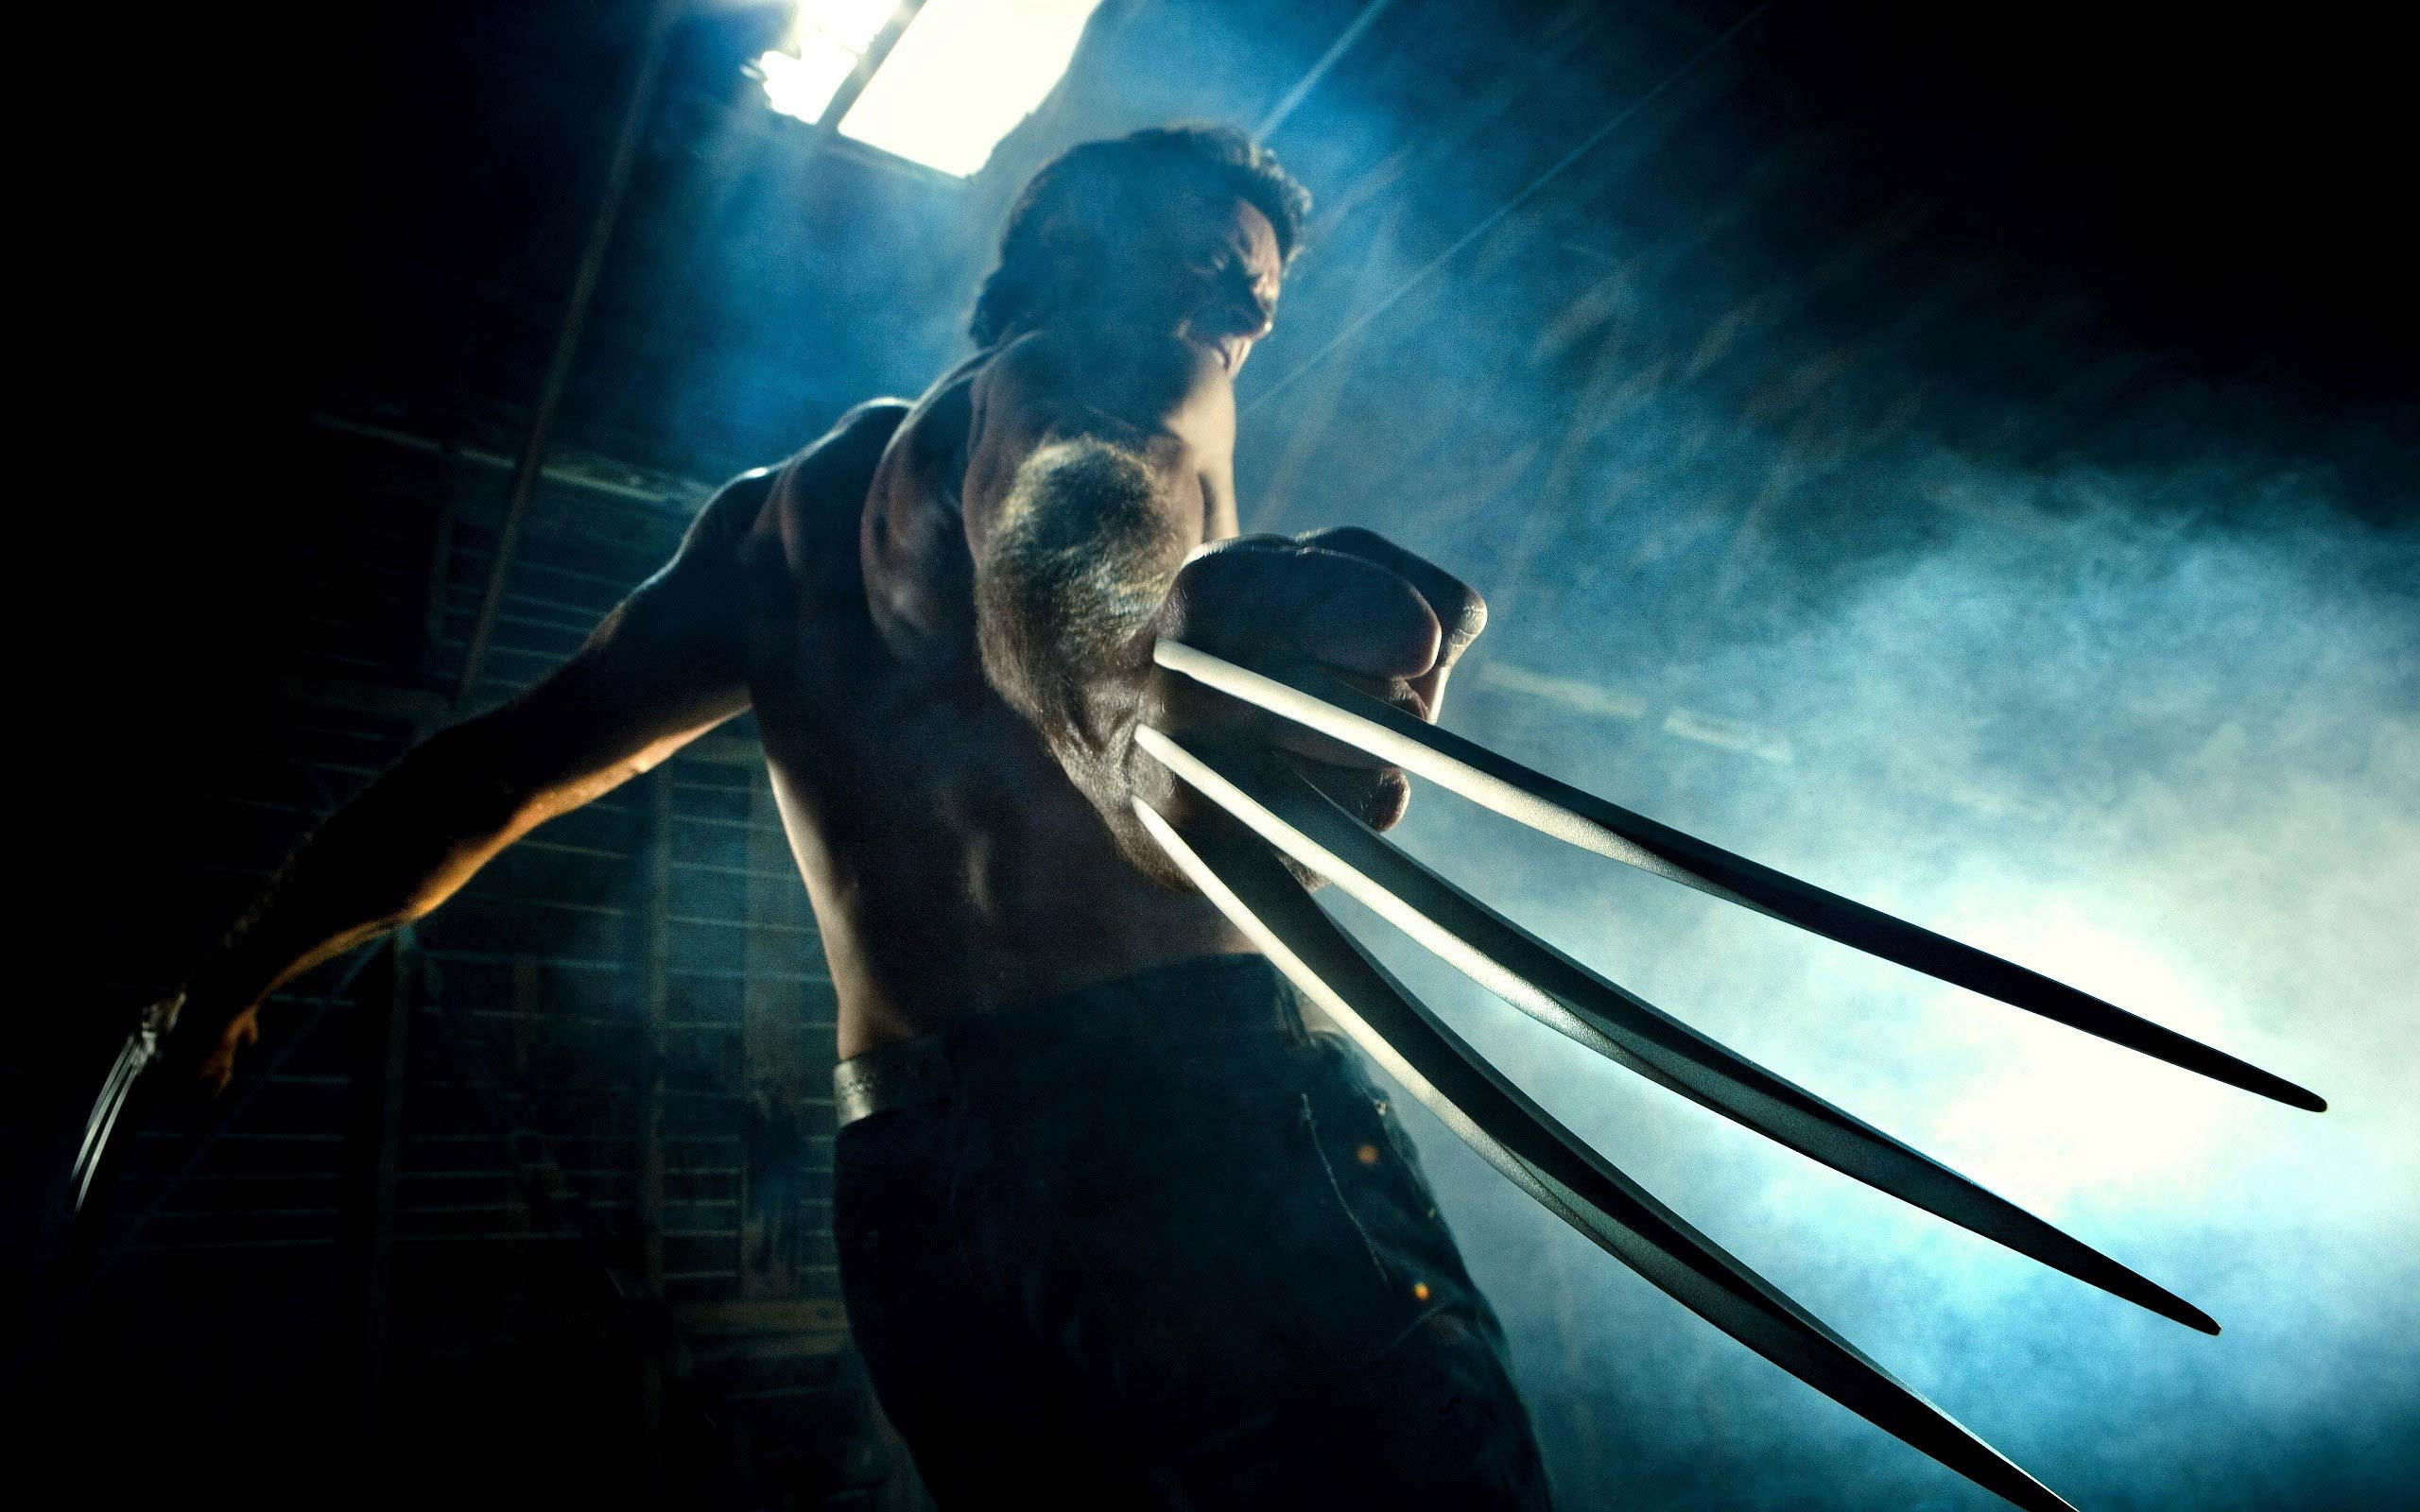 Hugh Jackman X Men Wolverine Wallpapers HD Collection   The Smashable 2560x1600